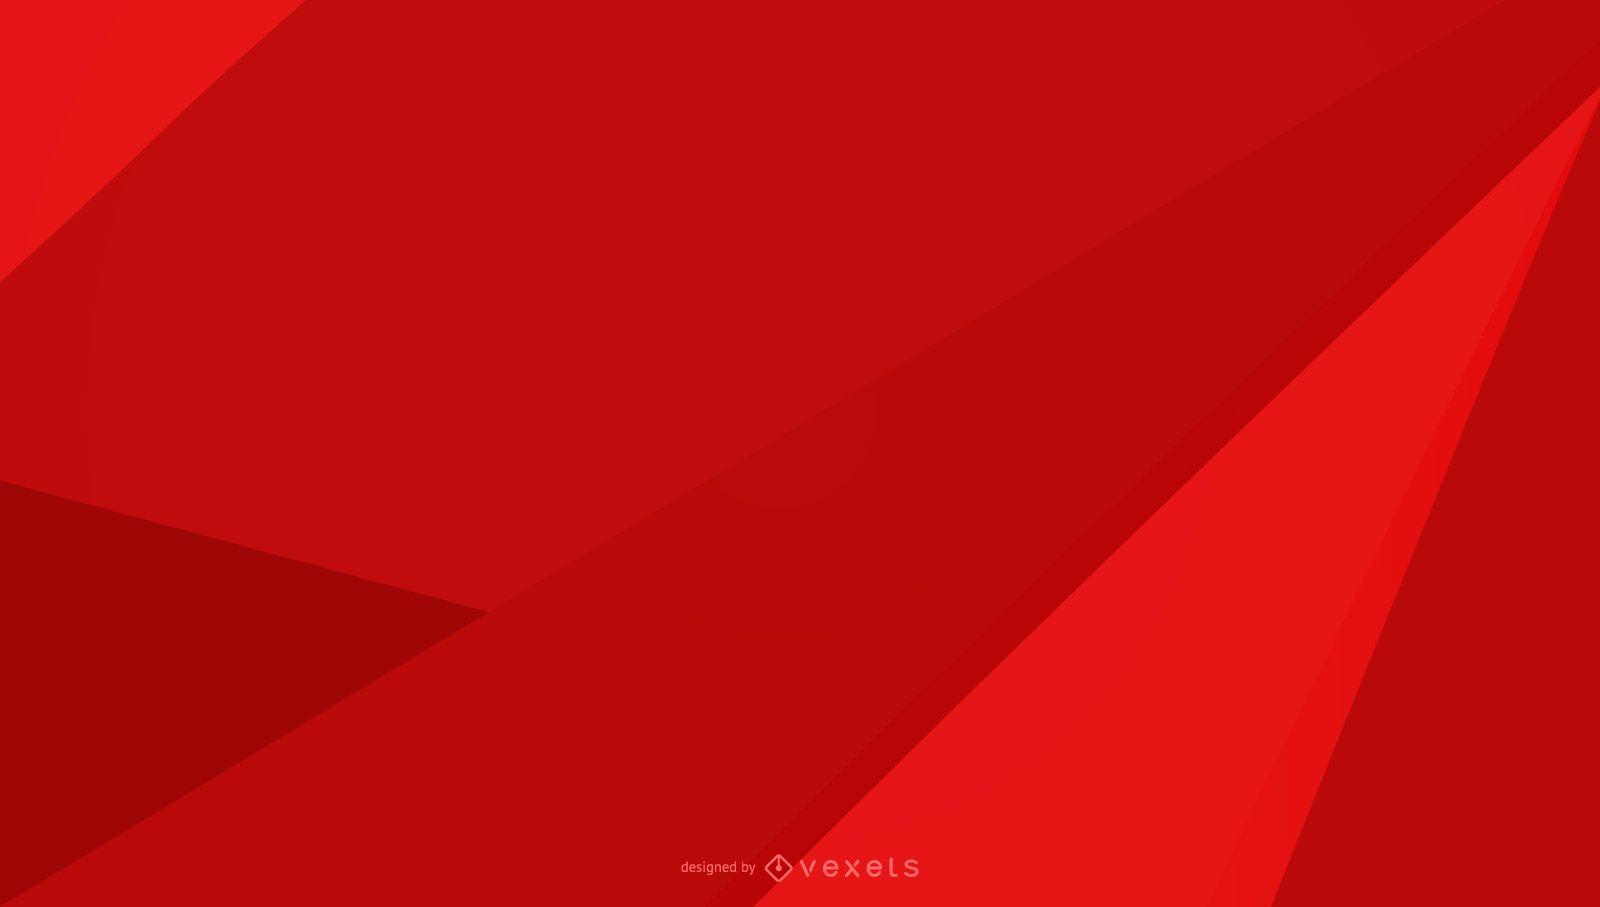 Red background geometric design